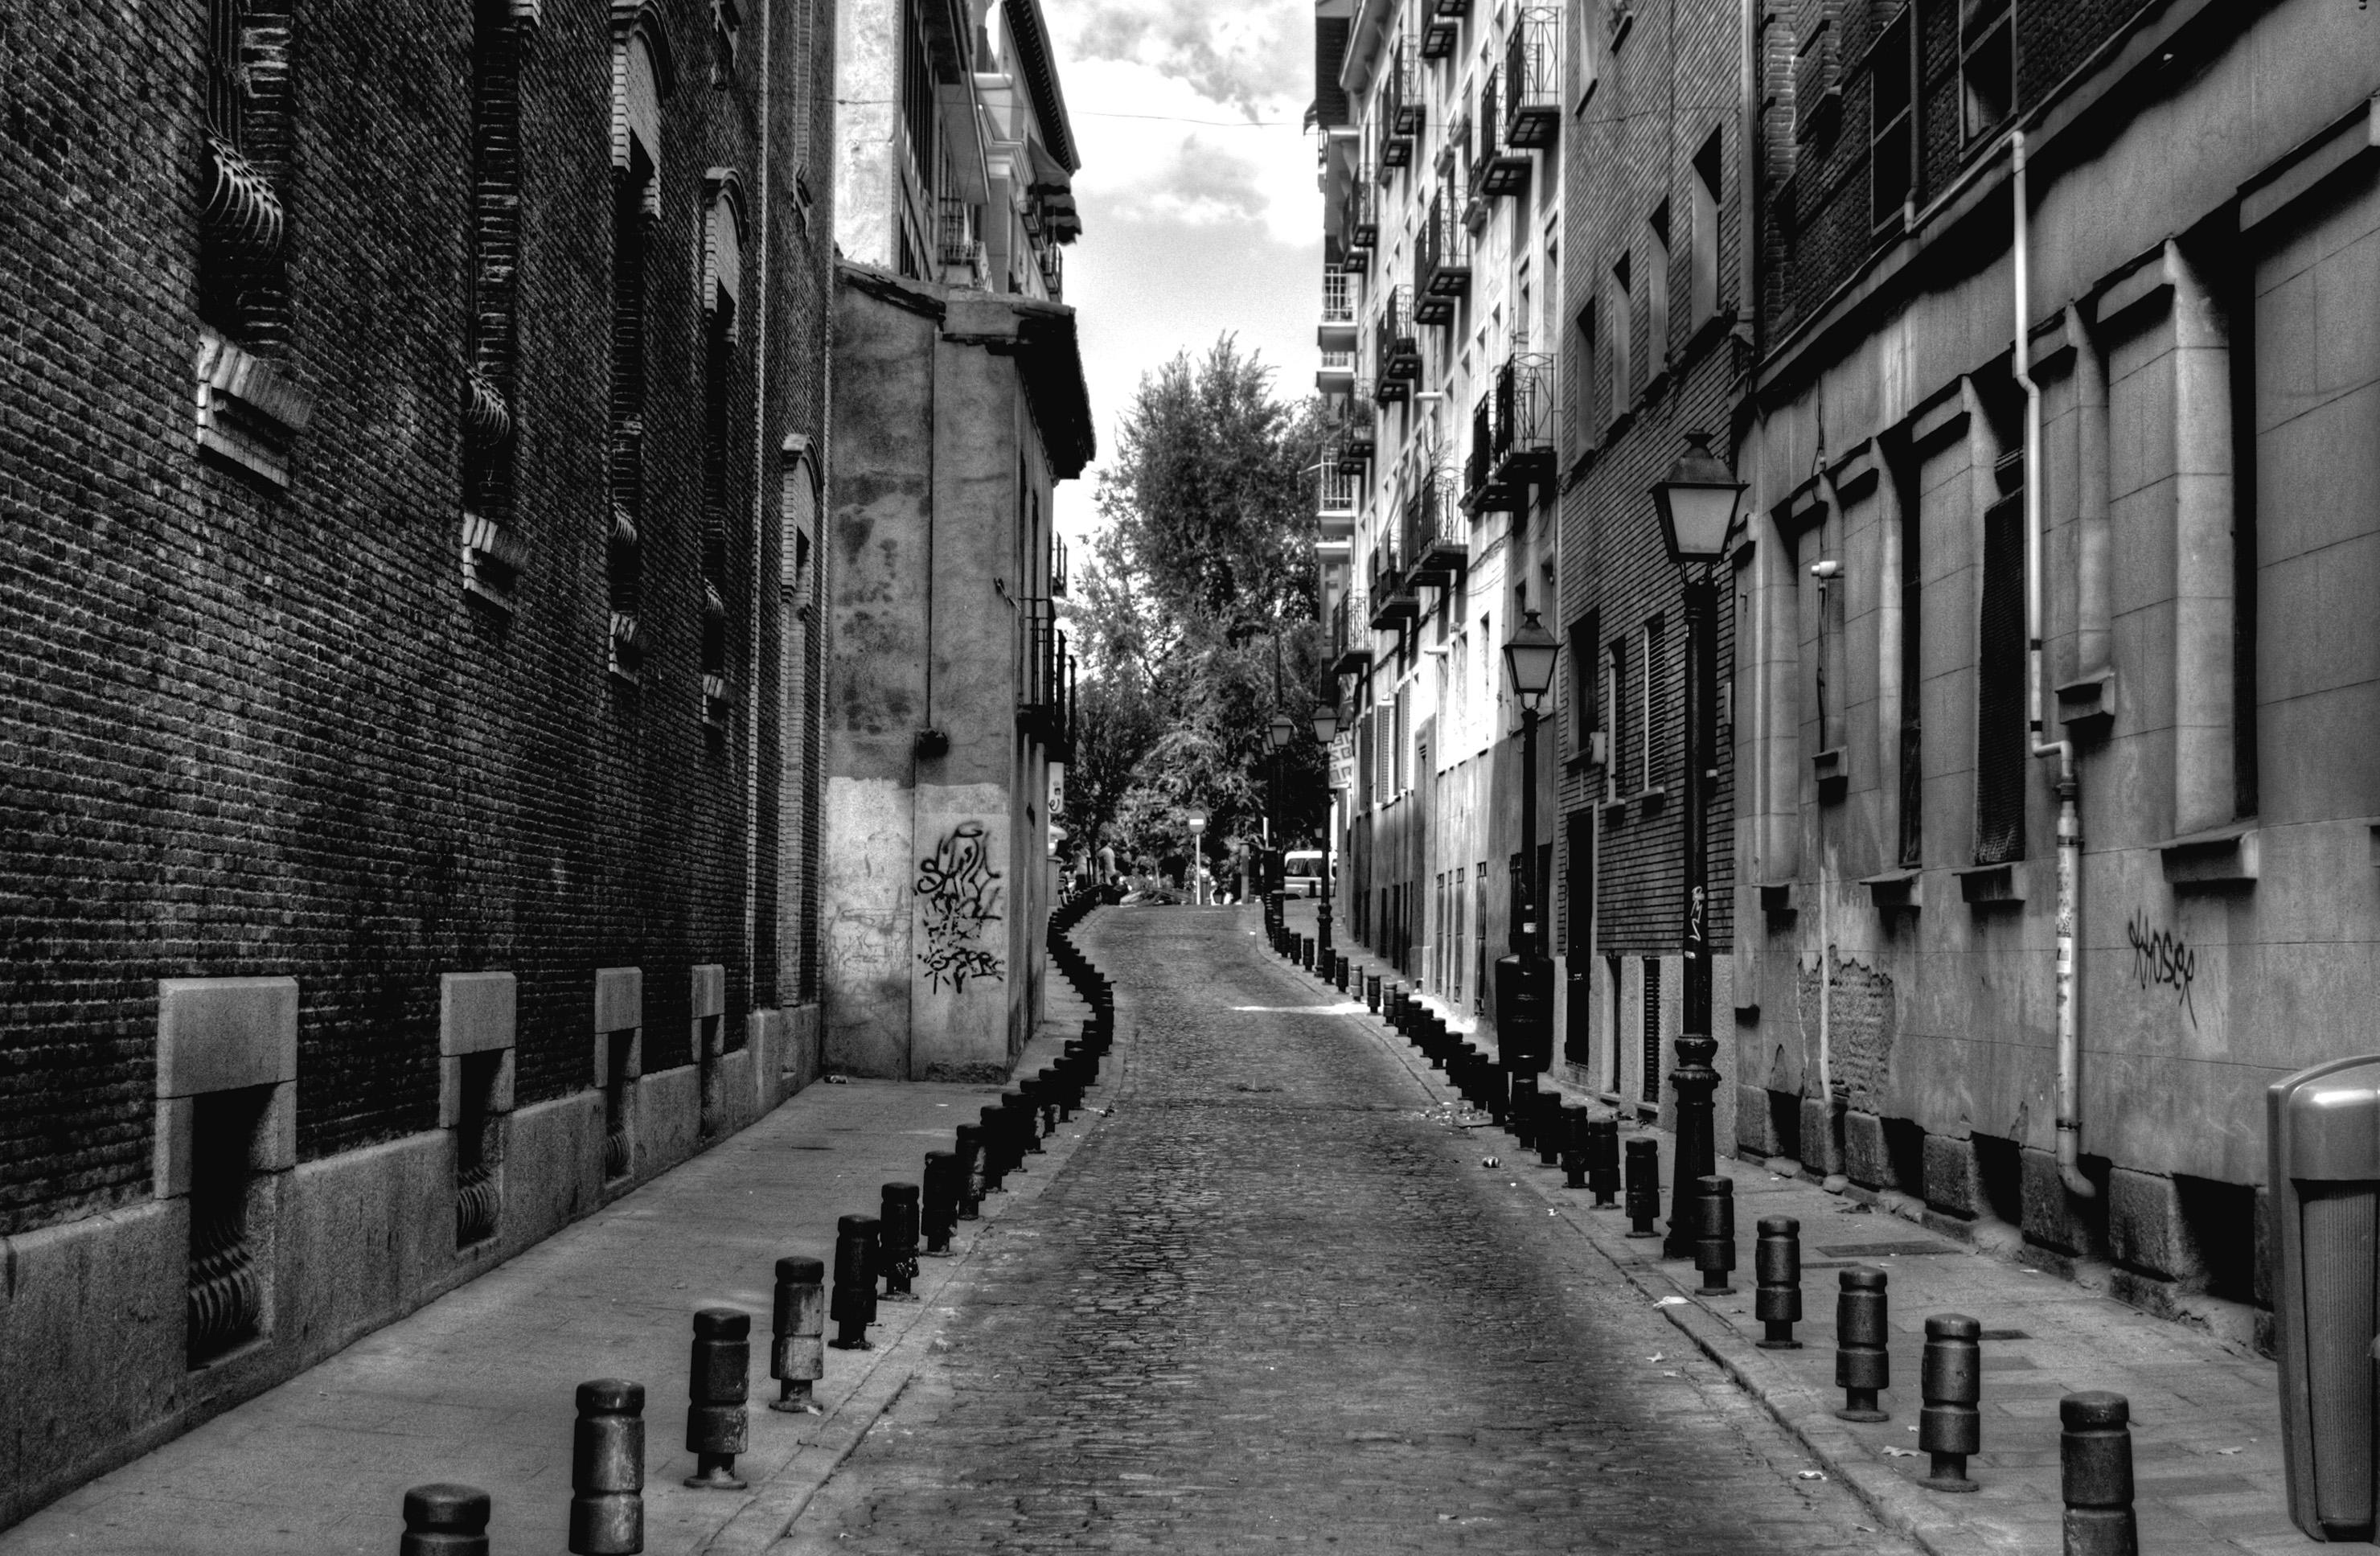 Lonely street photo